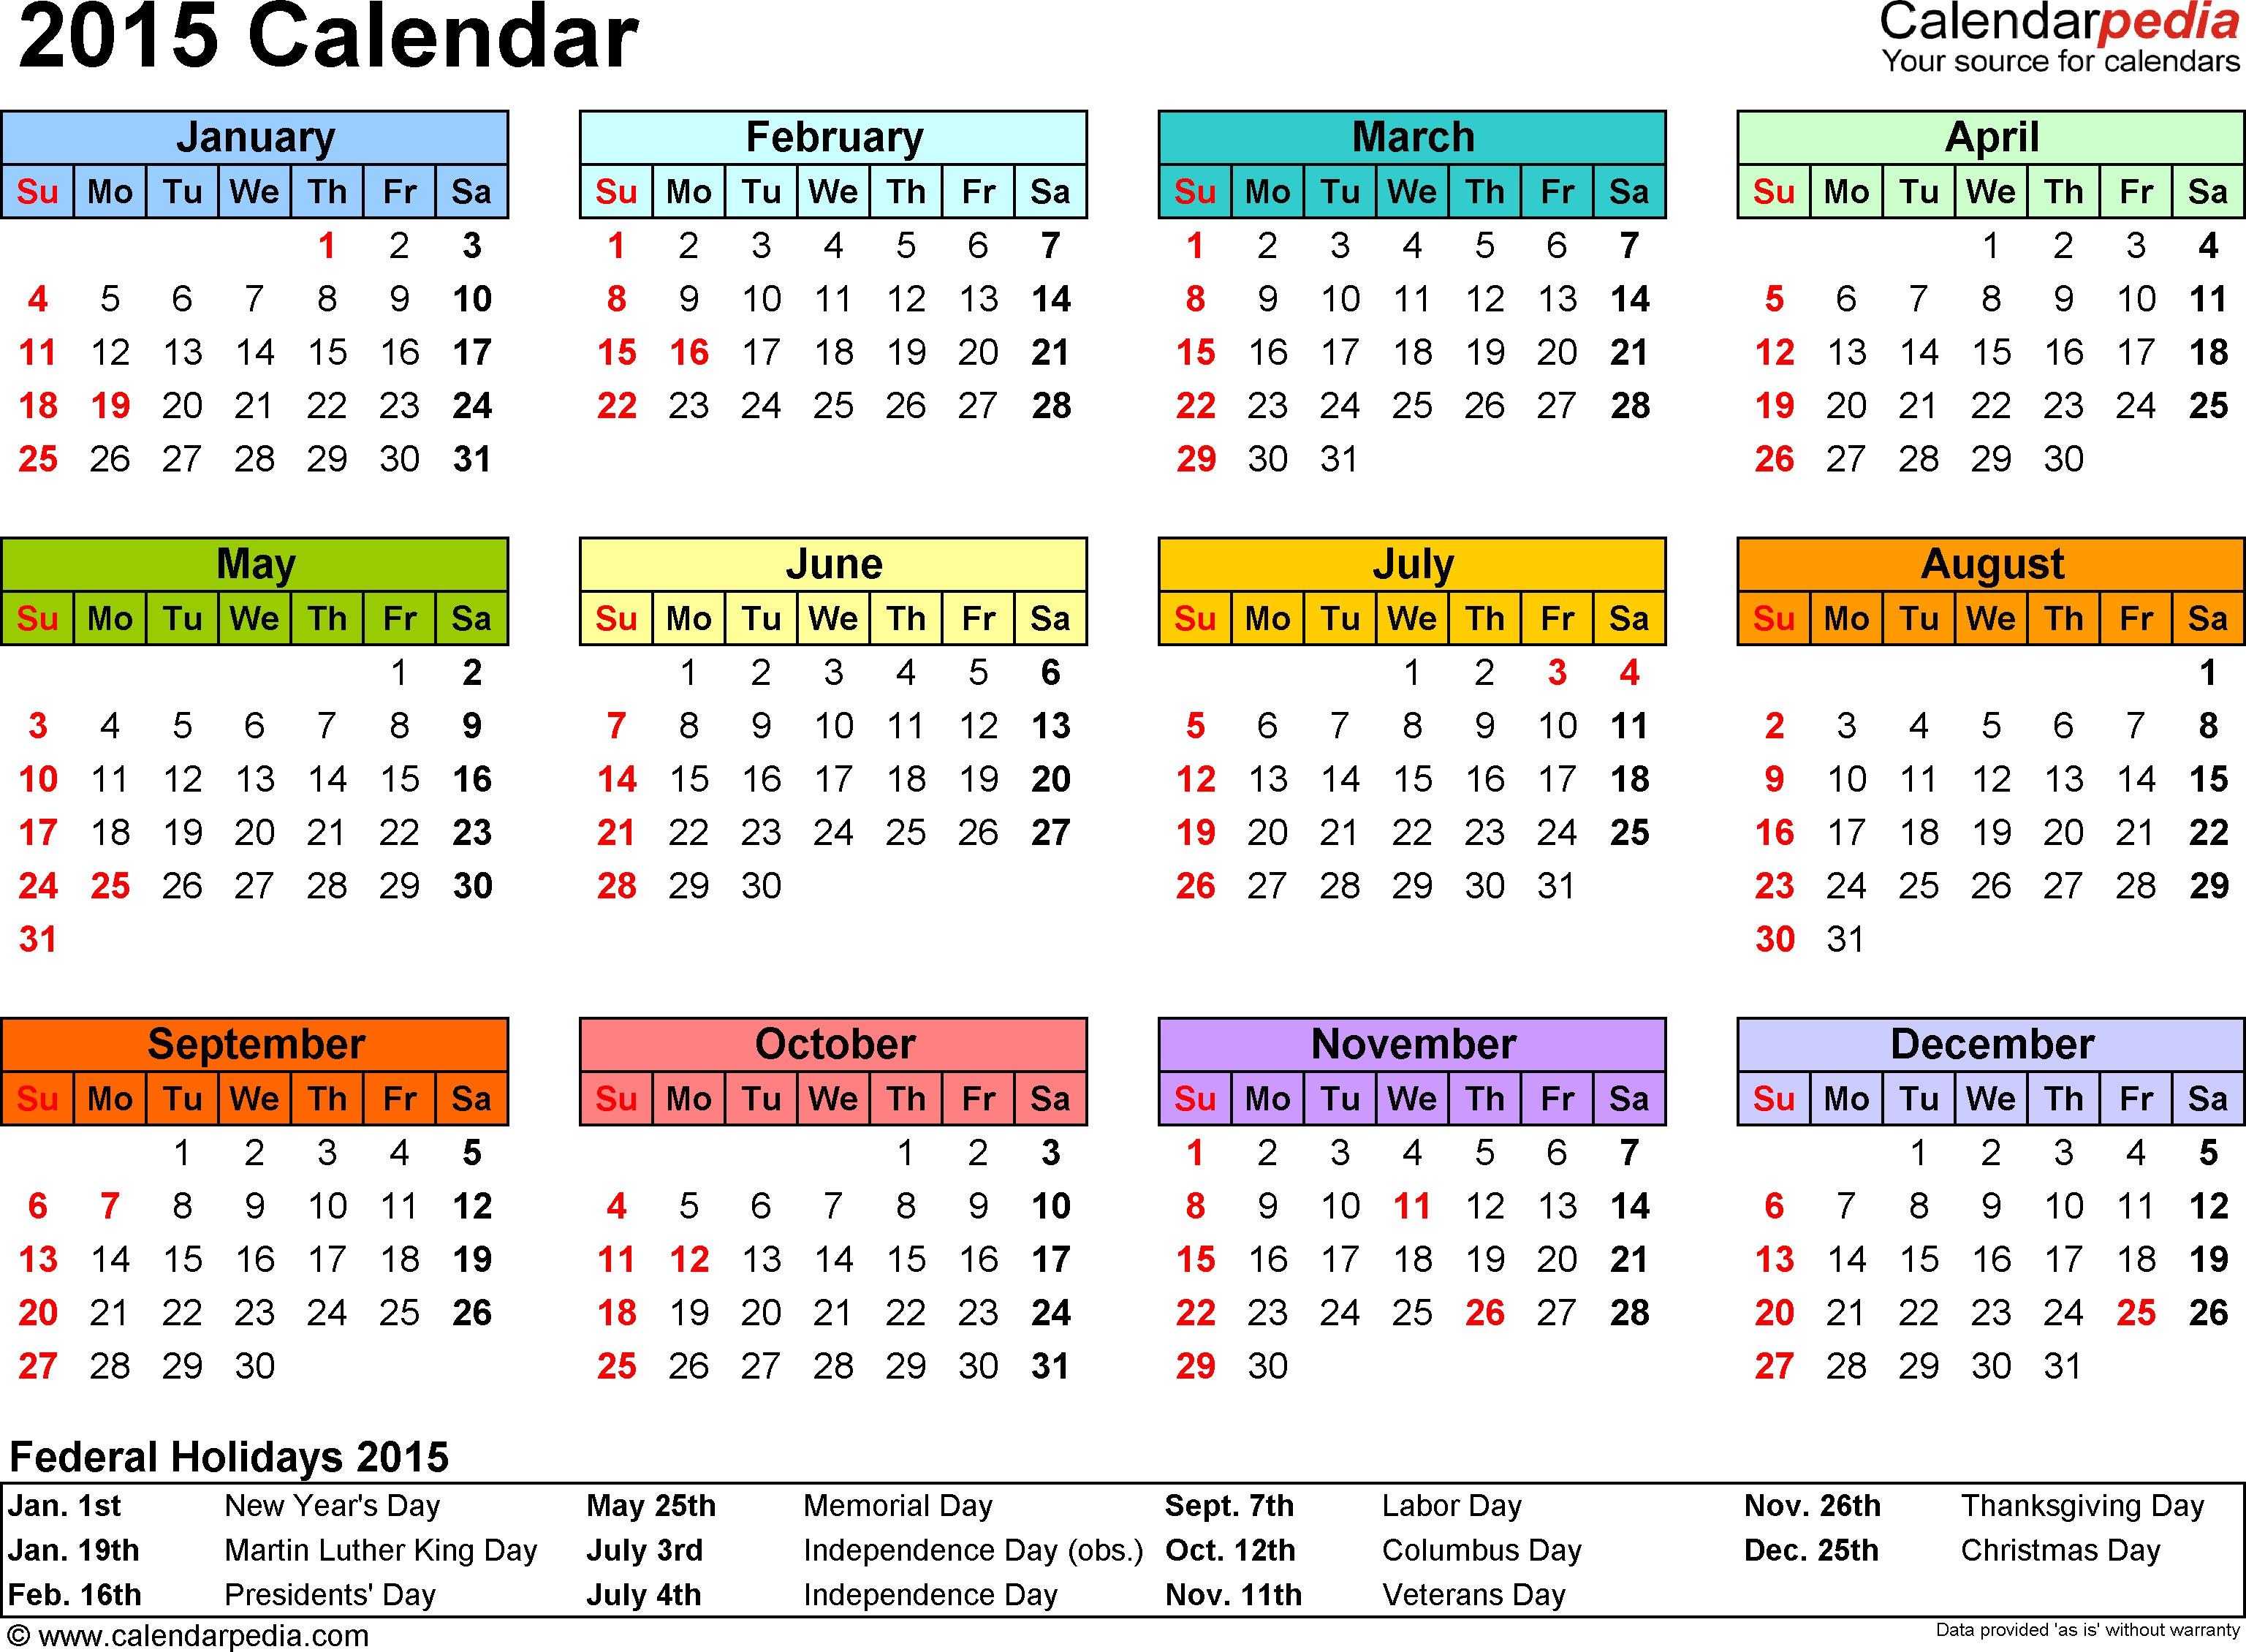 Printable Photo Calendar Free Calendars to Print 2015 – 2017 Printable Calendar